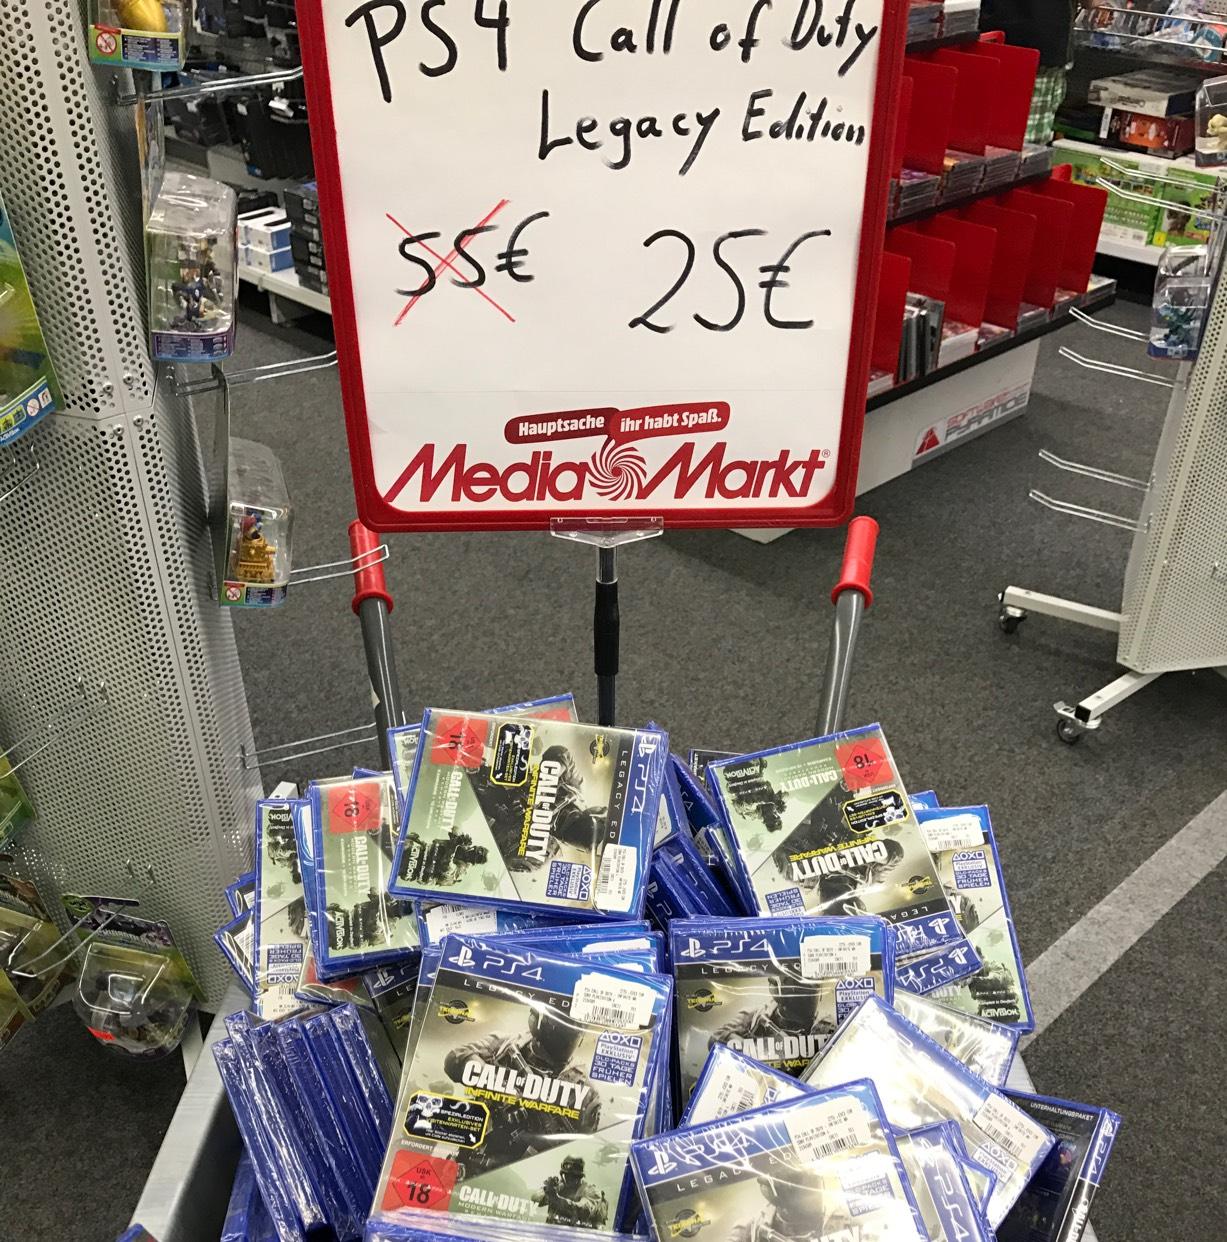 [PS 4] MM Wiesbaden Lokal - Call of Duty: Infinite Warfare Legacy Edition